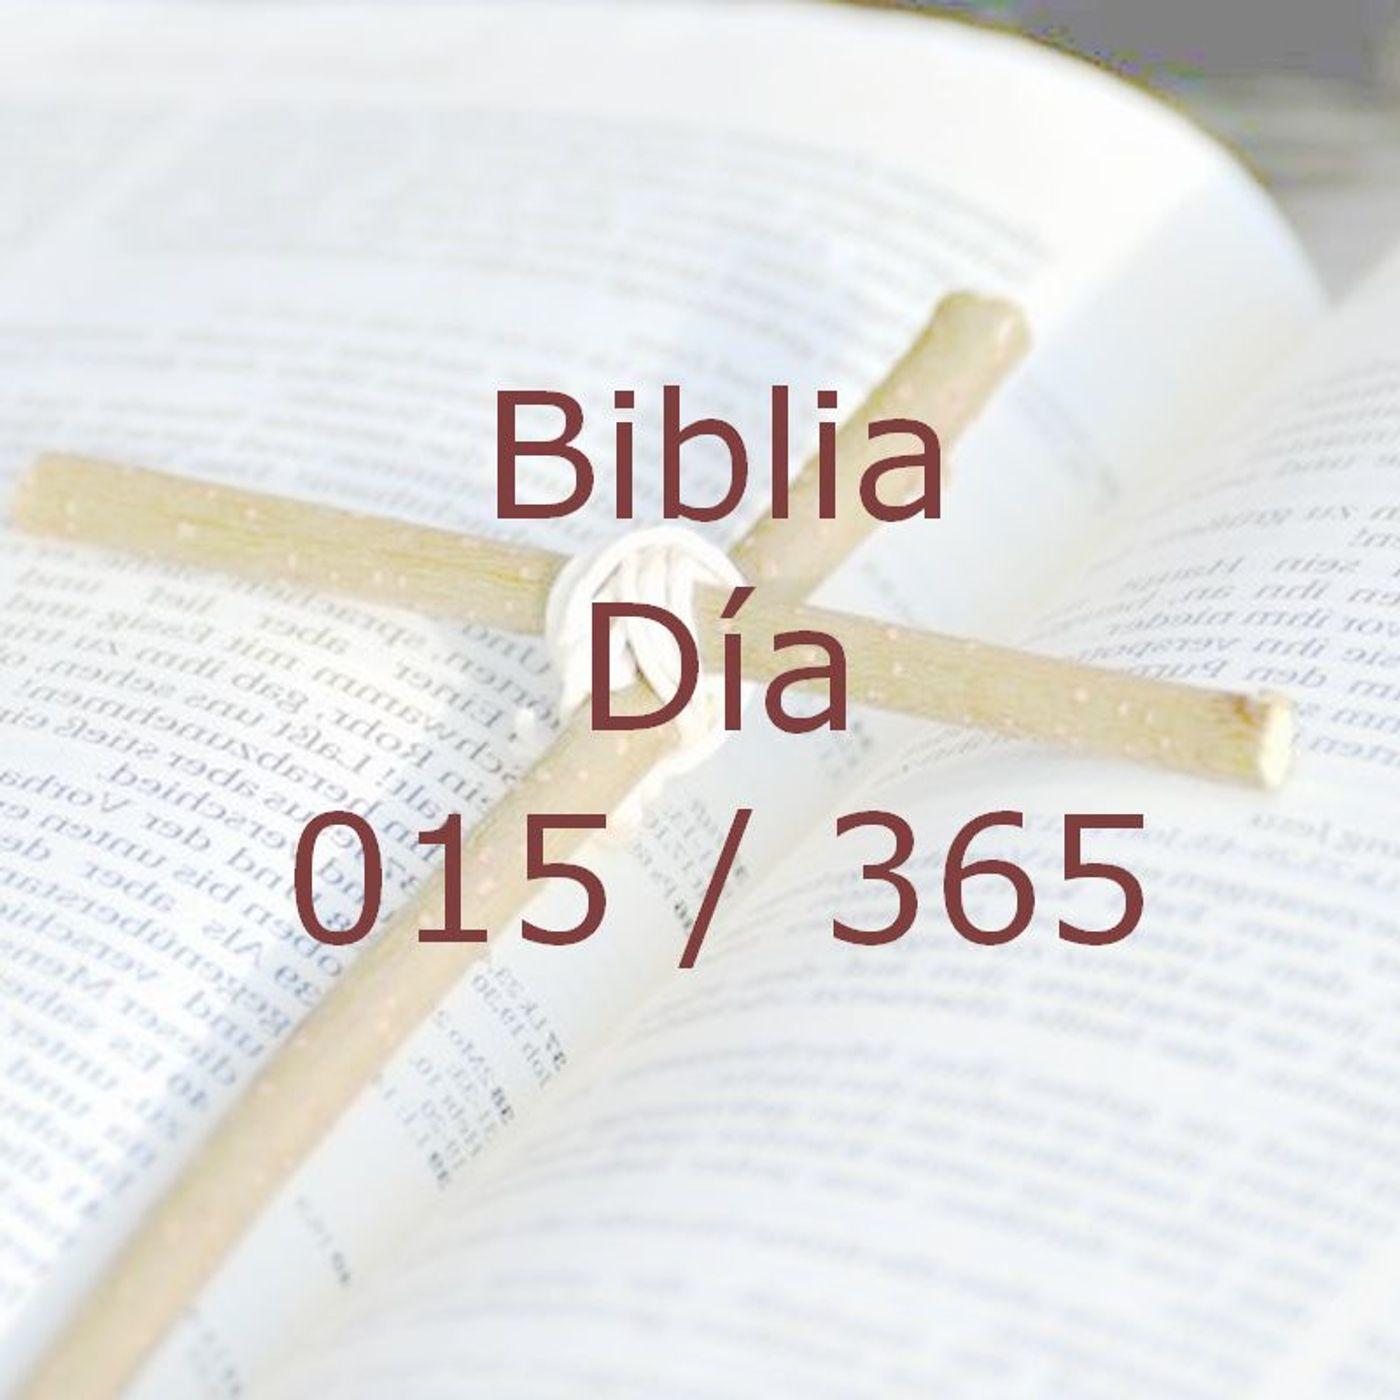 365 dias para la Biblia - Dia 015